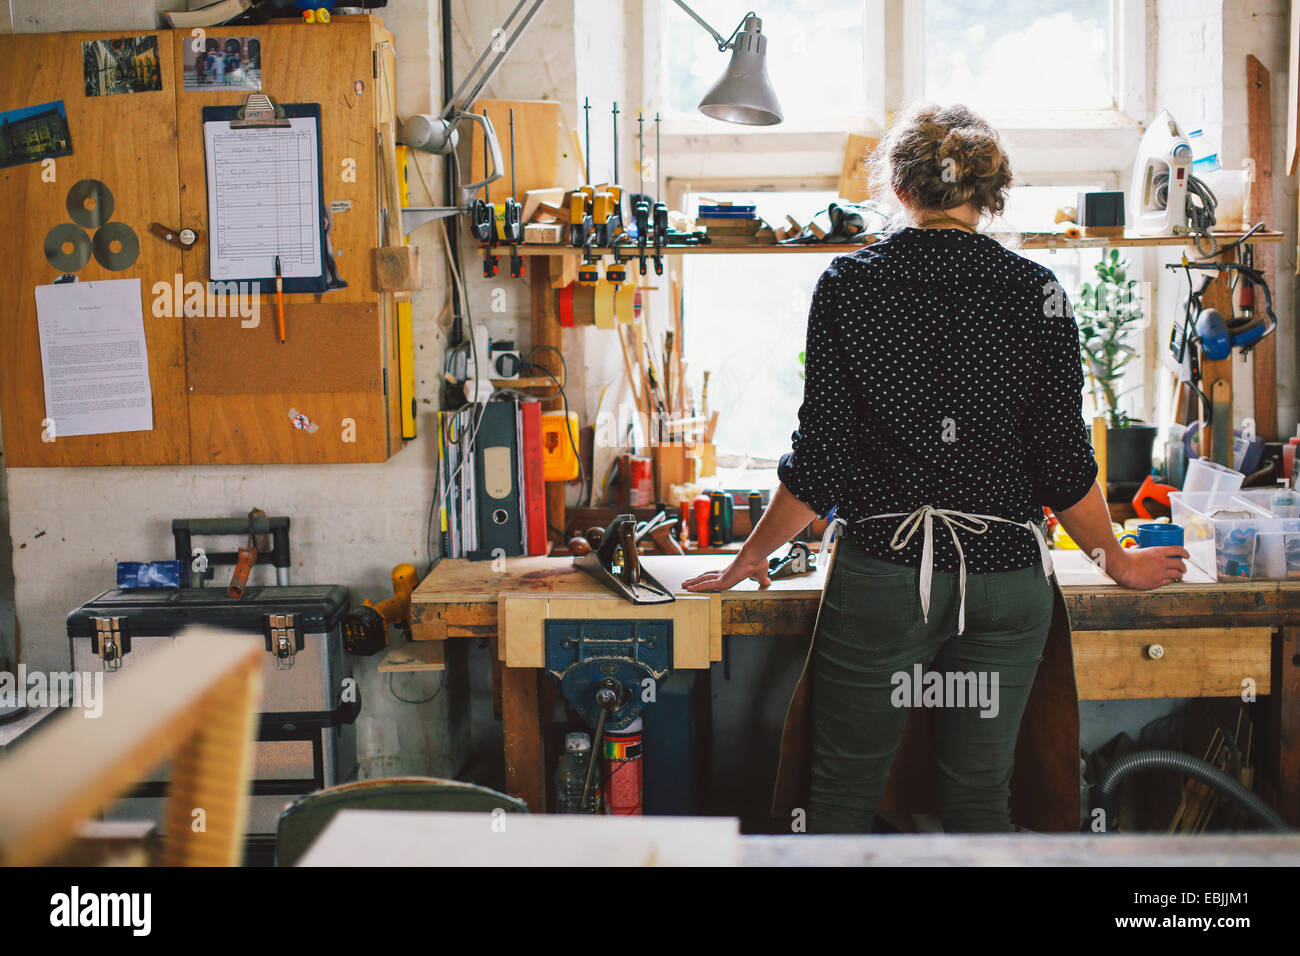 Vista trasera de la joven artesana en workbench en taller de órgano de tubos Imagen De Stock